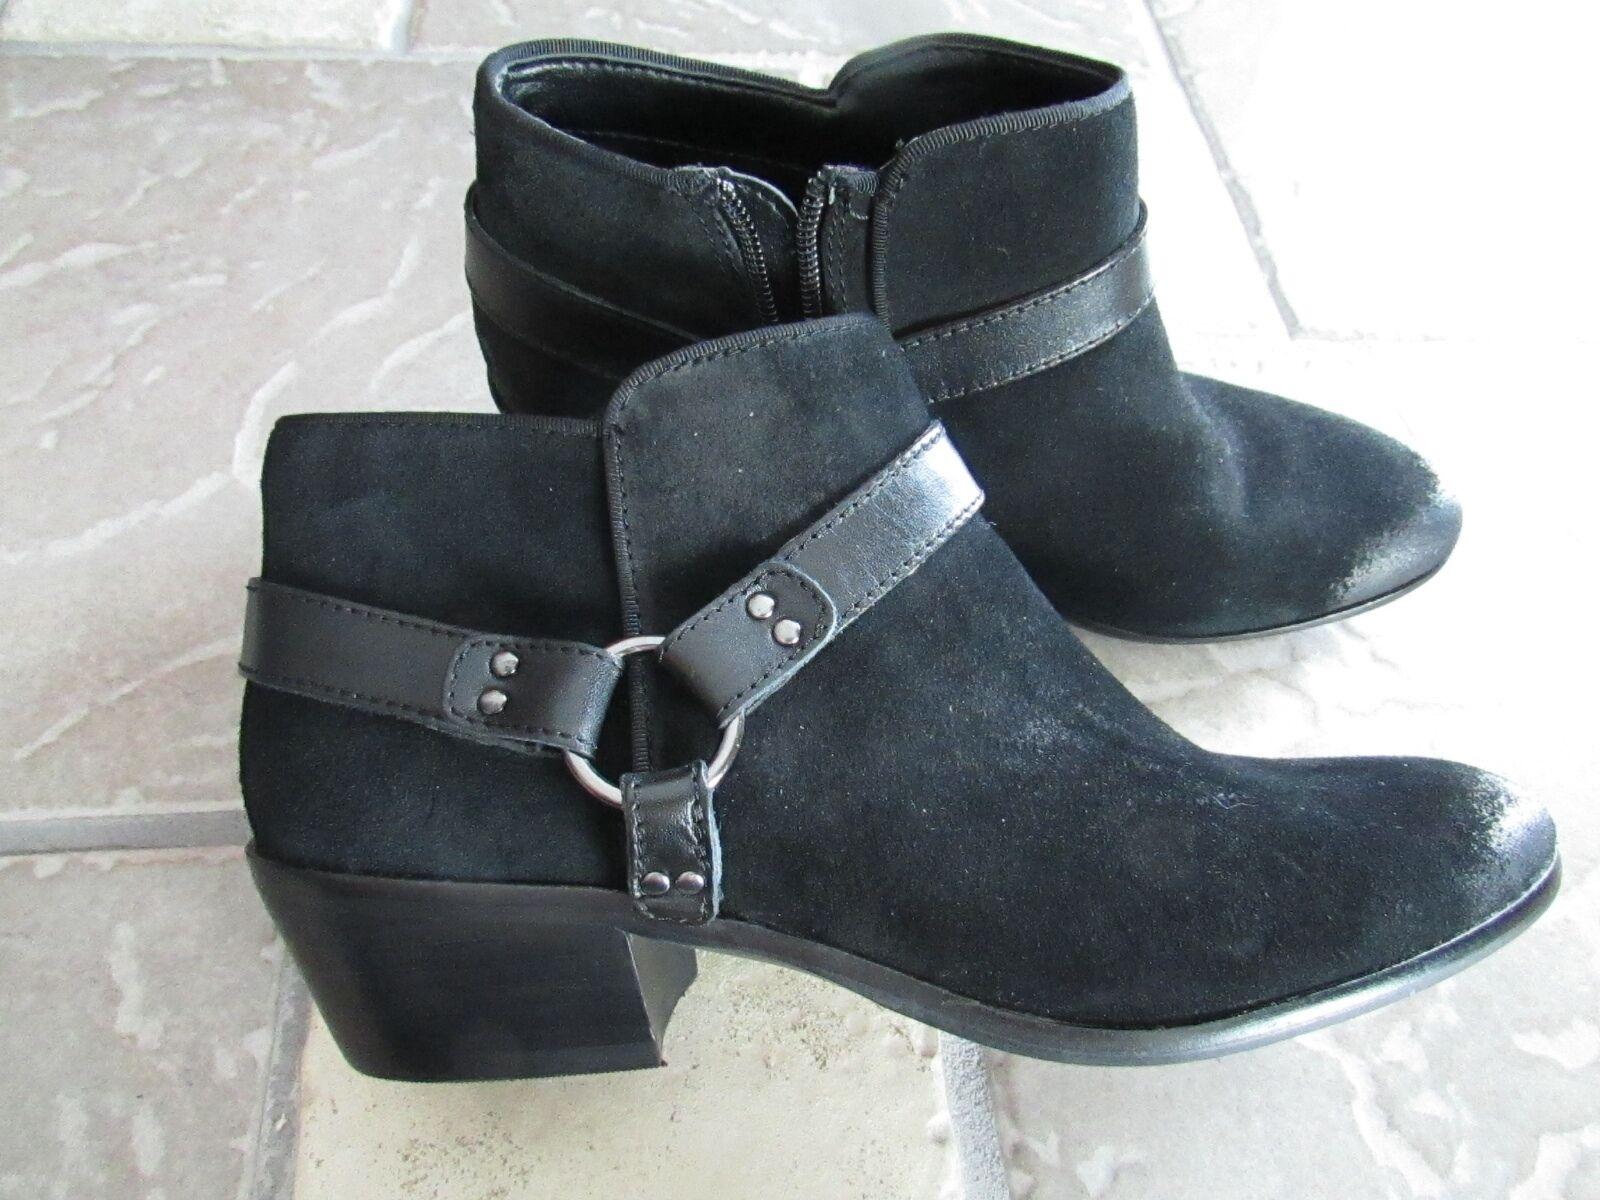 NEW SAM EDELMAN BLACK SUEDE ANKLE BOOTIES BOOTS Damenschuhe 7 ZIP SIDE